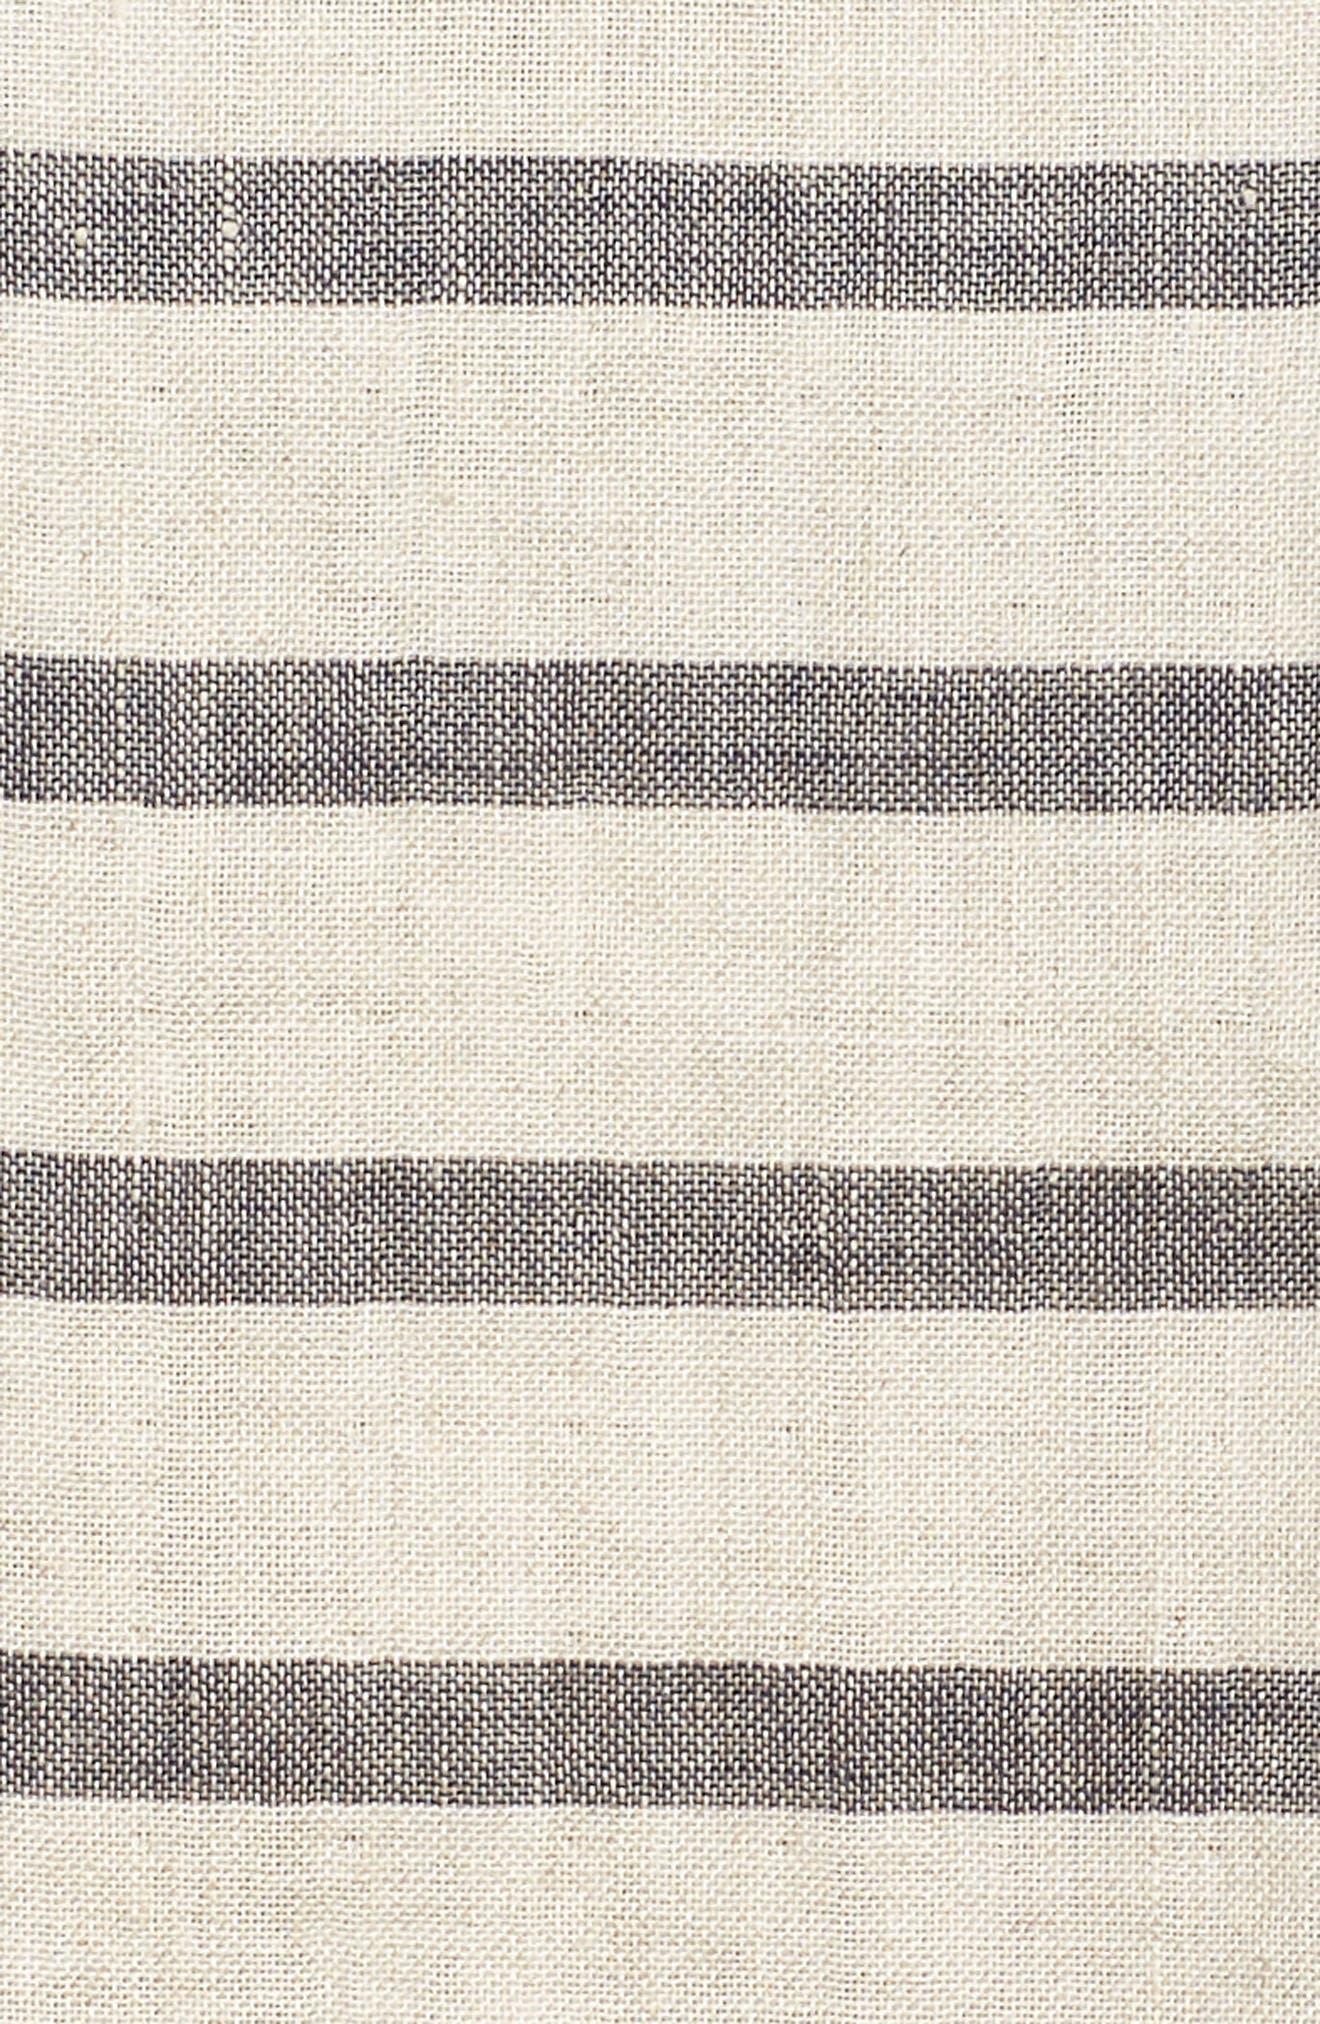 Stripe Linen & Organic Cotton Top,                             Alternate thumbnail 6, color,                             257